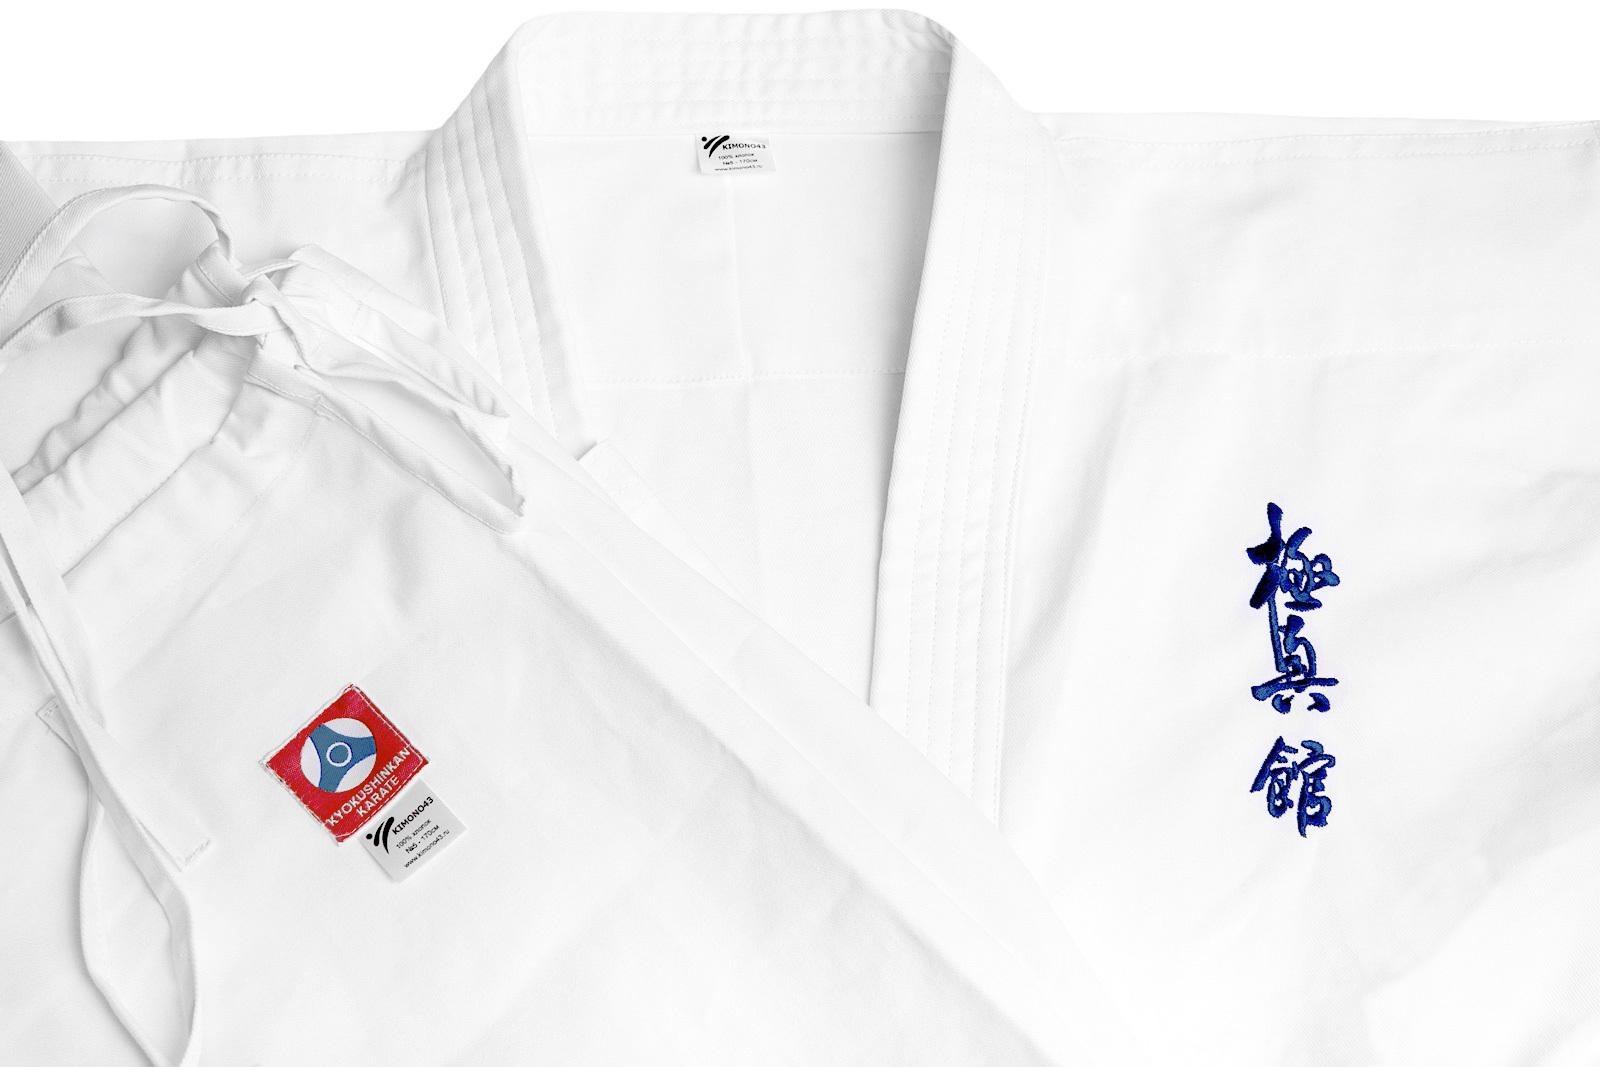 Кимоно / Доги Доги BFS - KYOKUSHINKAN / Pro dogi_kyokushinkan_1.jpg